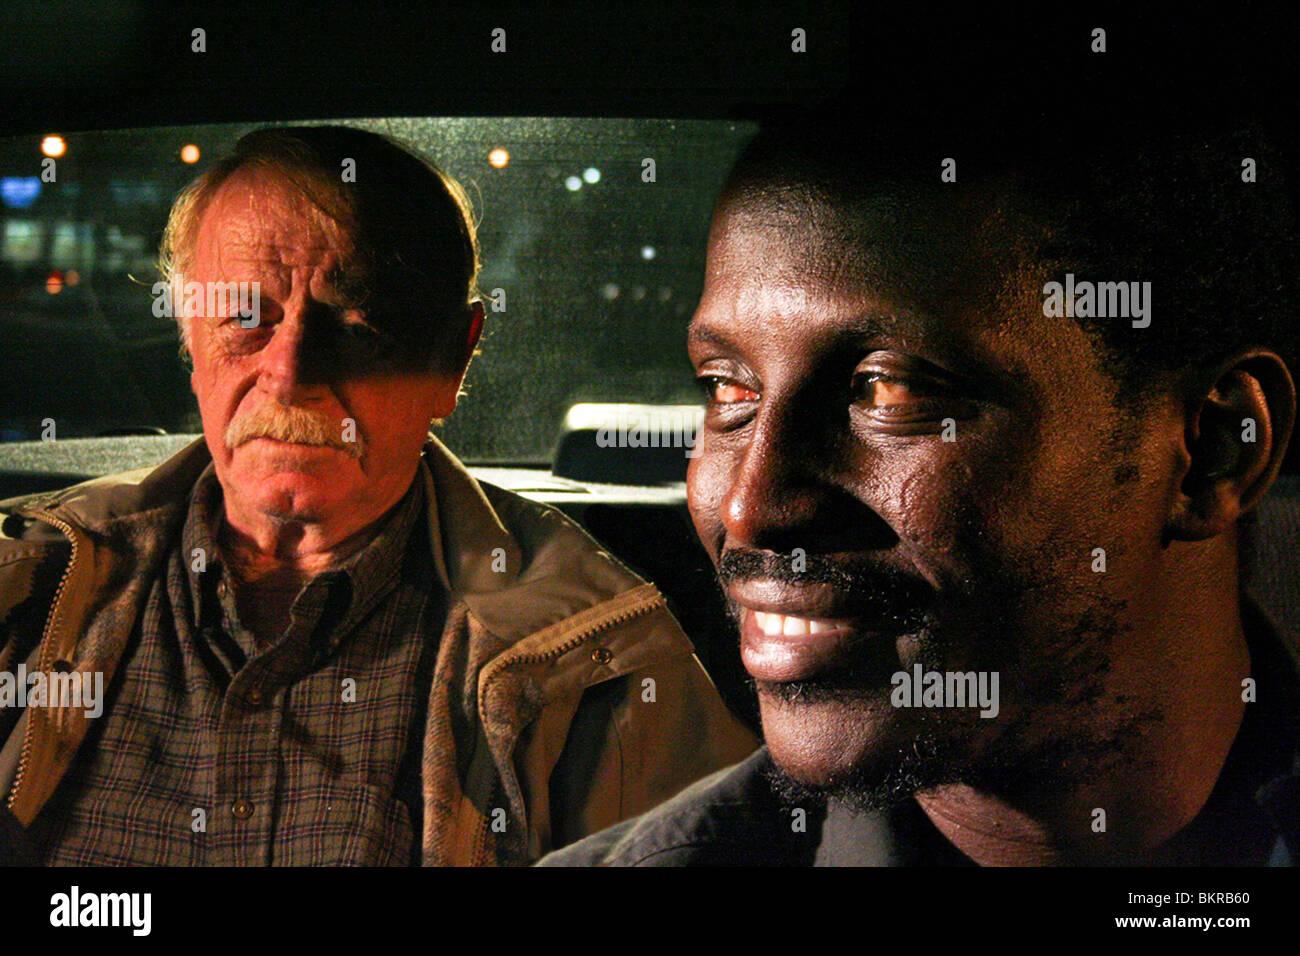 GOODBYE SOLO (2008) RED WEST, SOULEYMANE SY SAVANE RAMIN BAHRANI (DIR) 001 - Stock Image